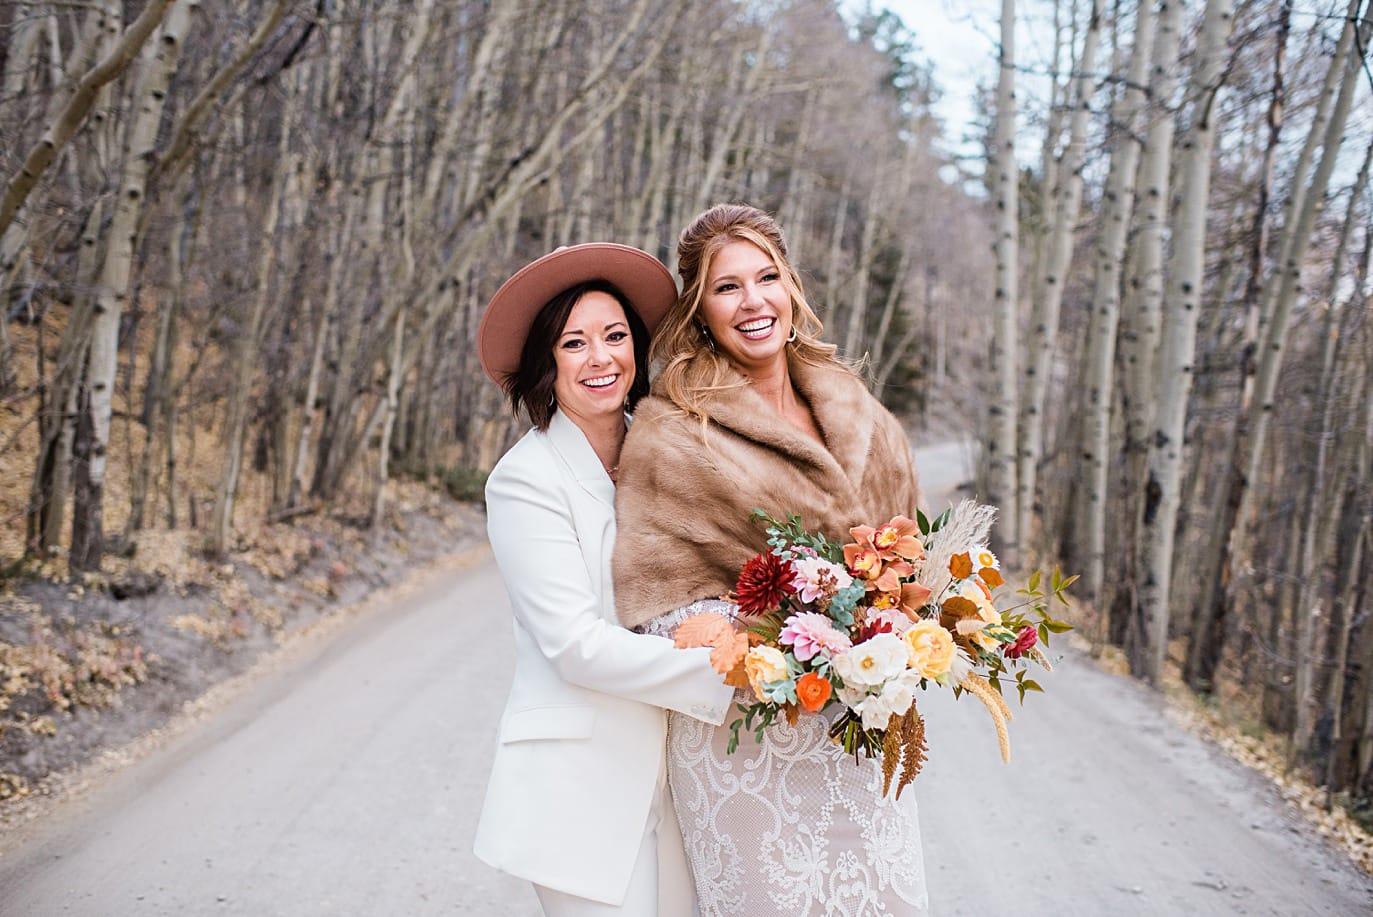 two brides along Boreas Pass road at Breckenridge microwedding by Breckenridge wedding photographer Jennie Crate